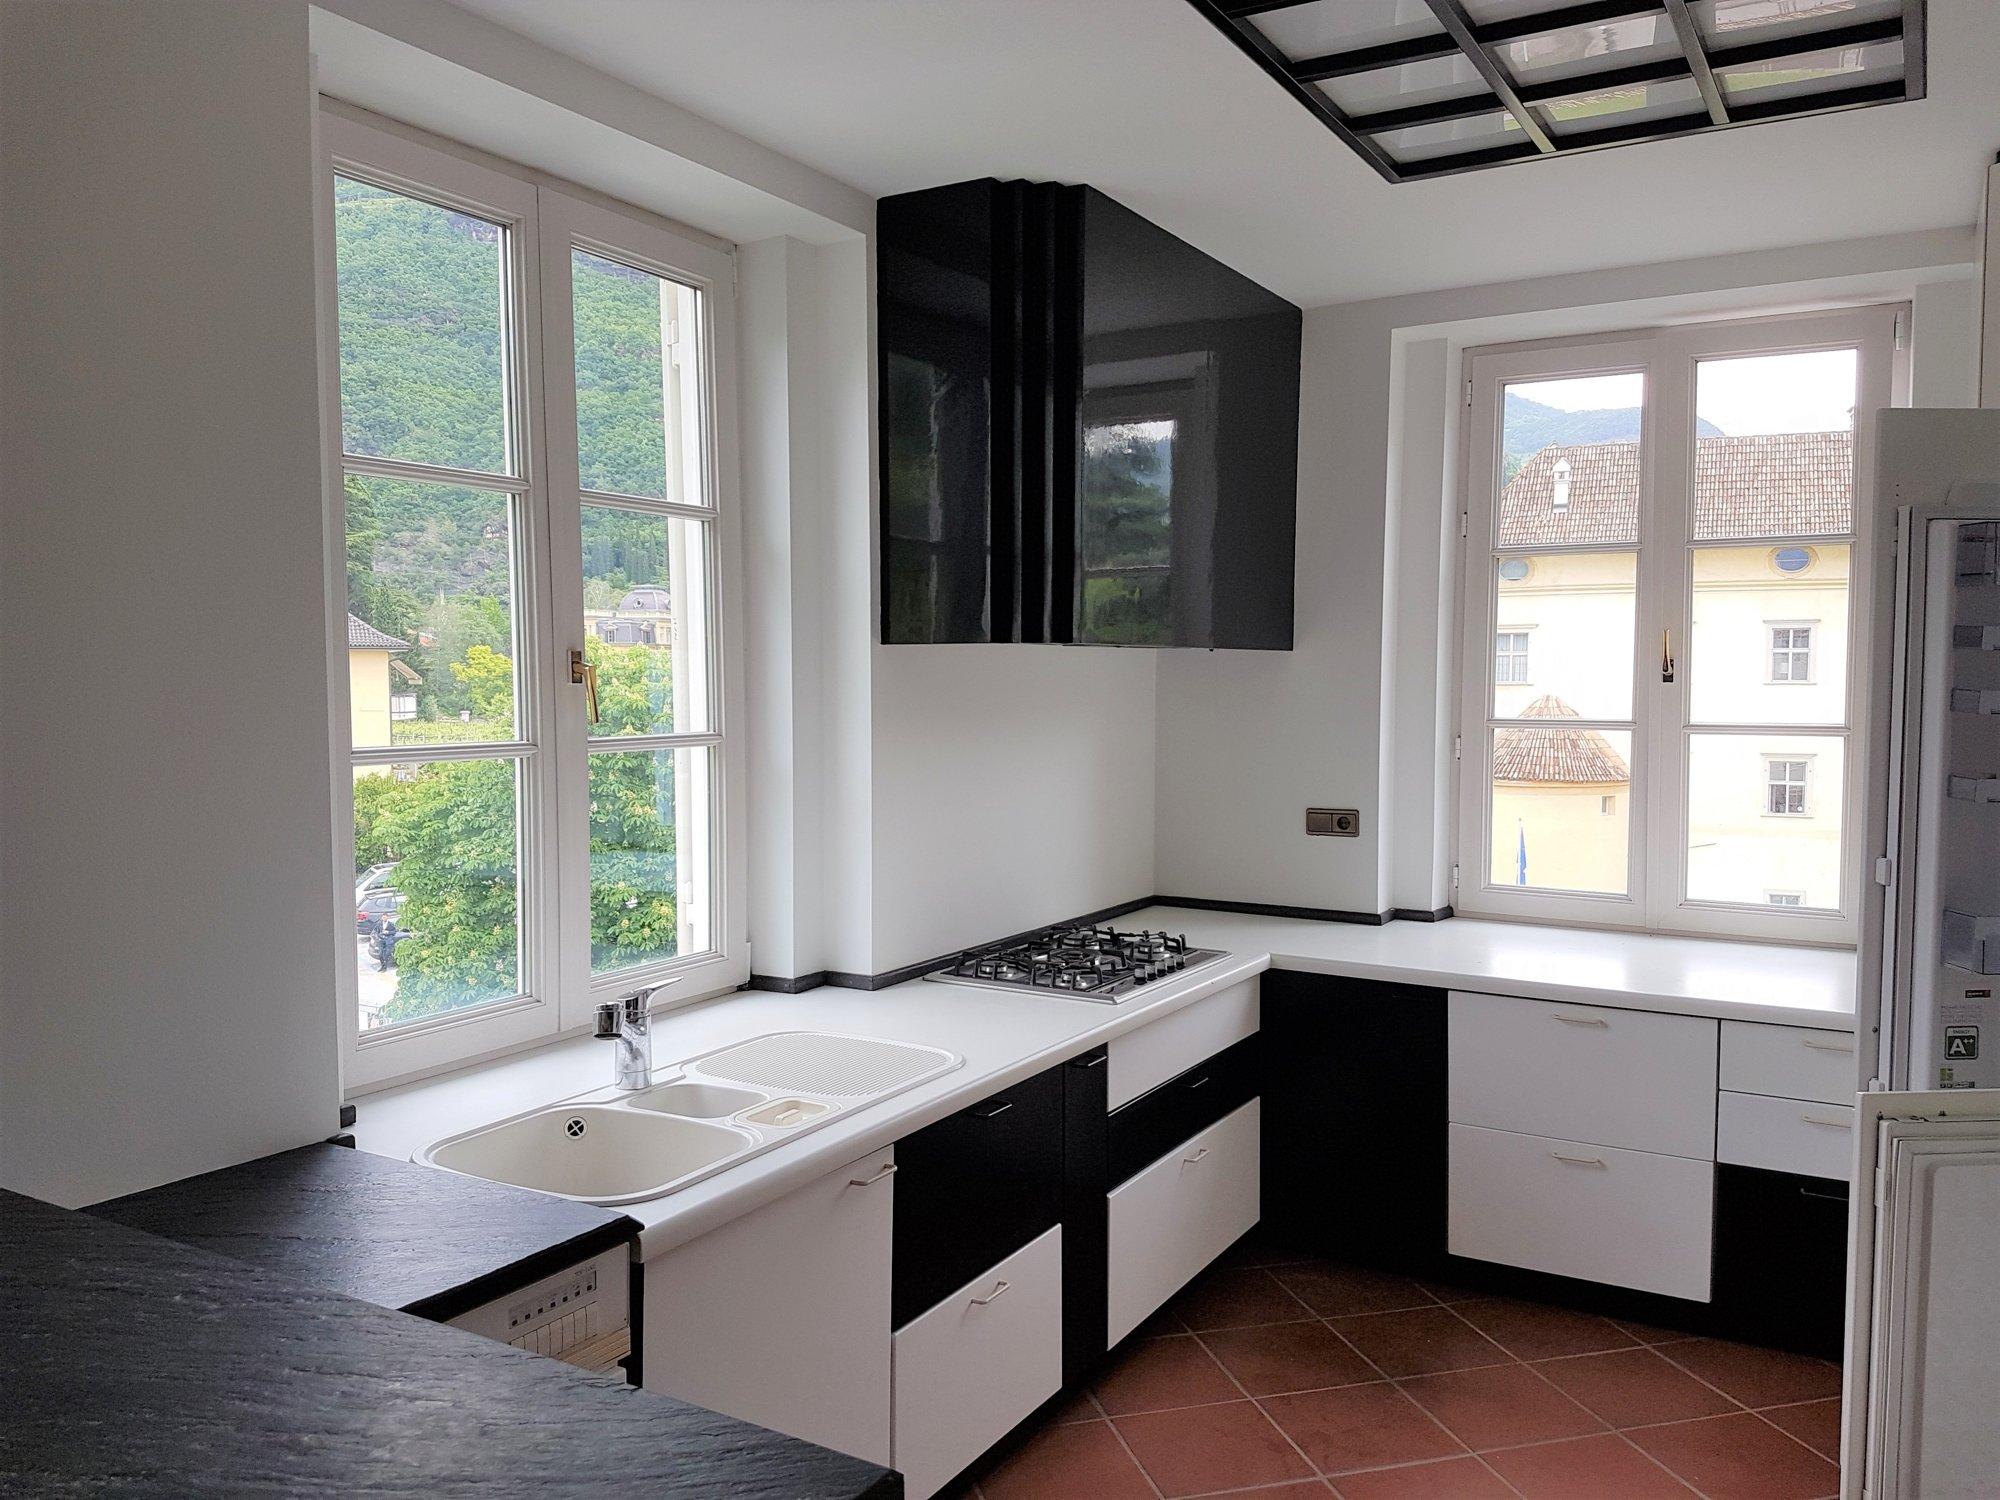 Küche_cucina